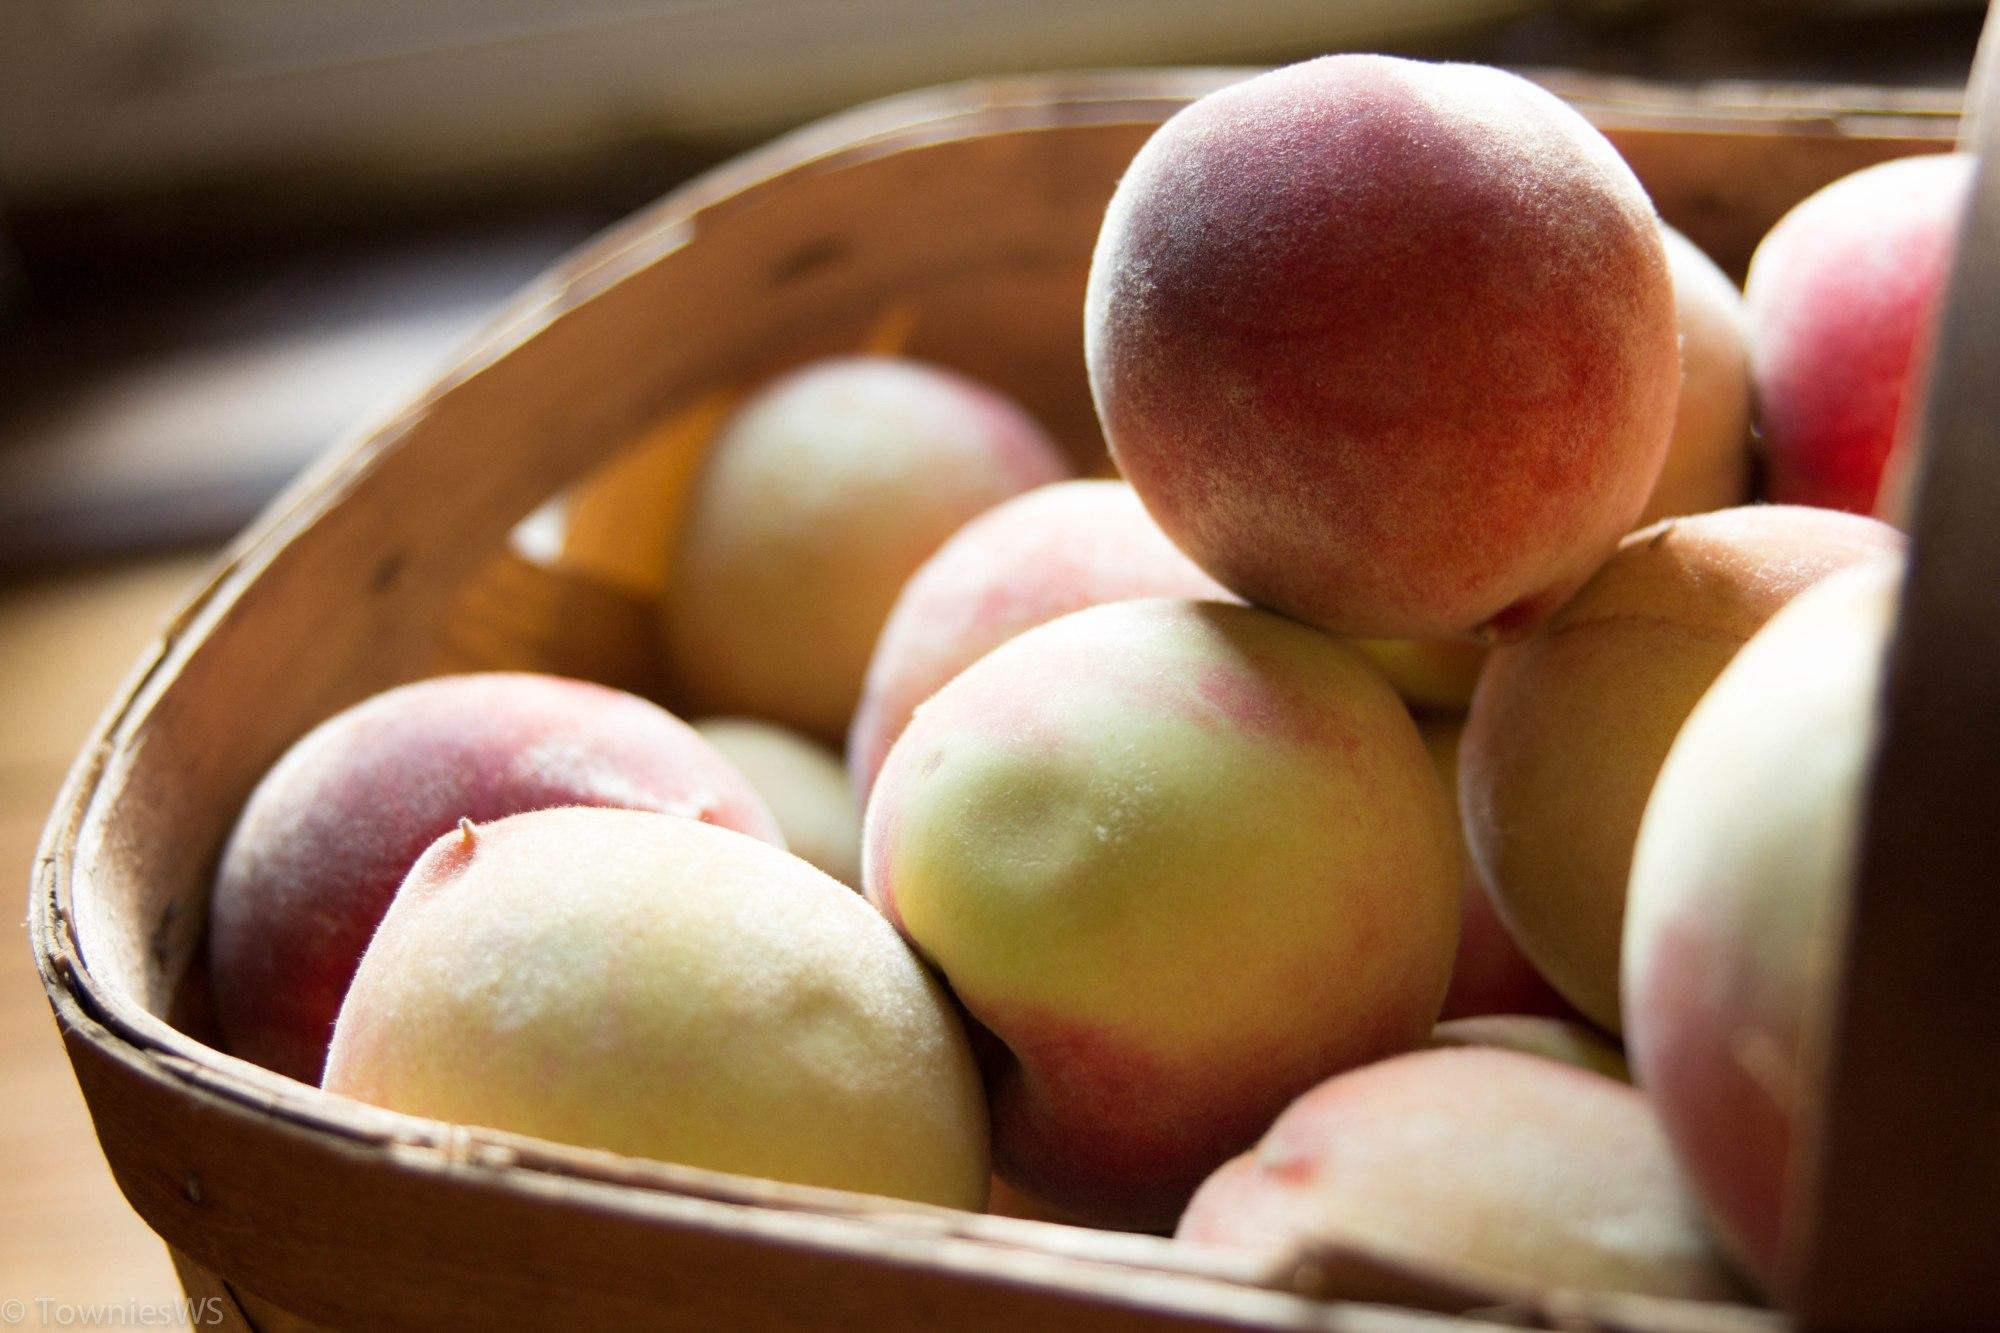 Peaches_TowniesWS.com